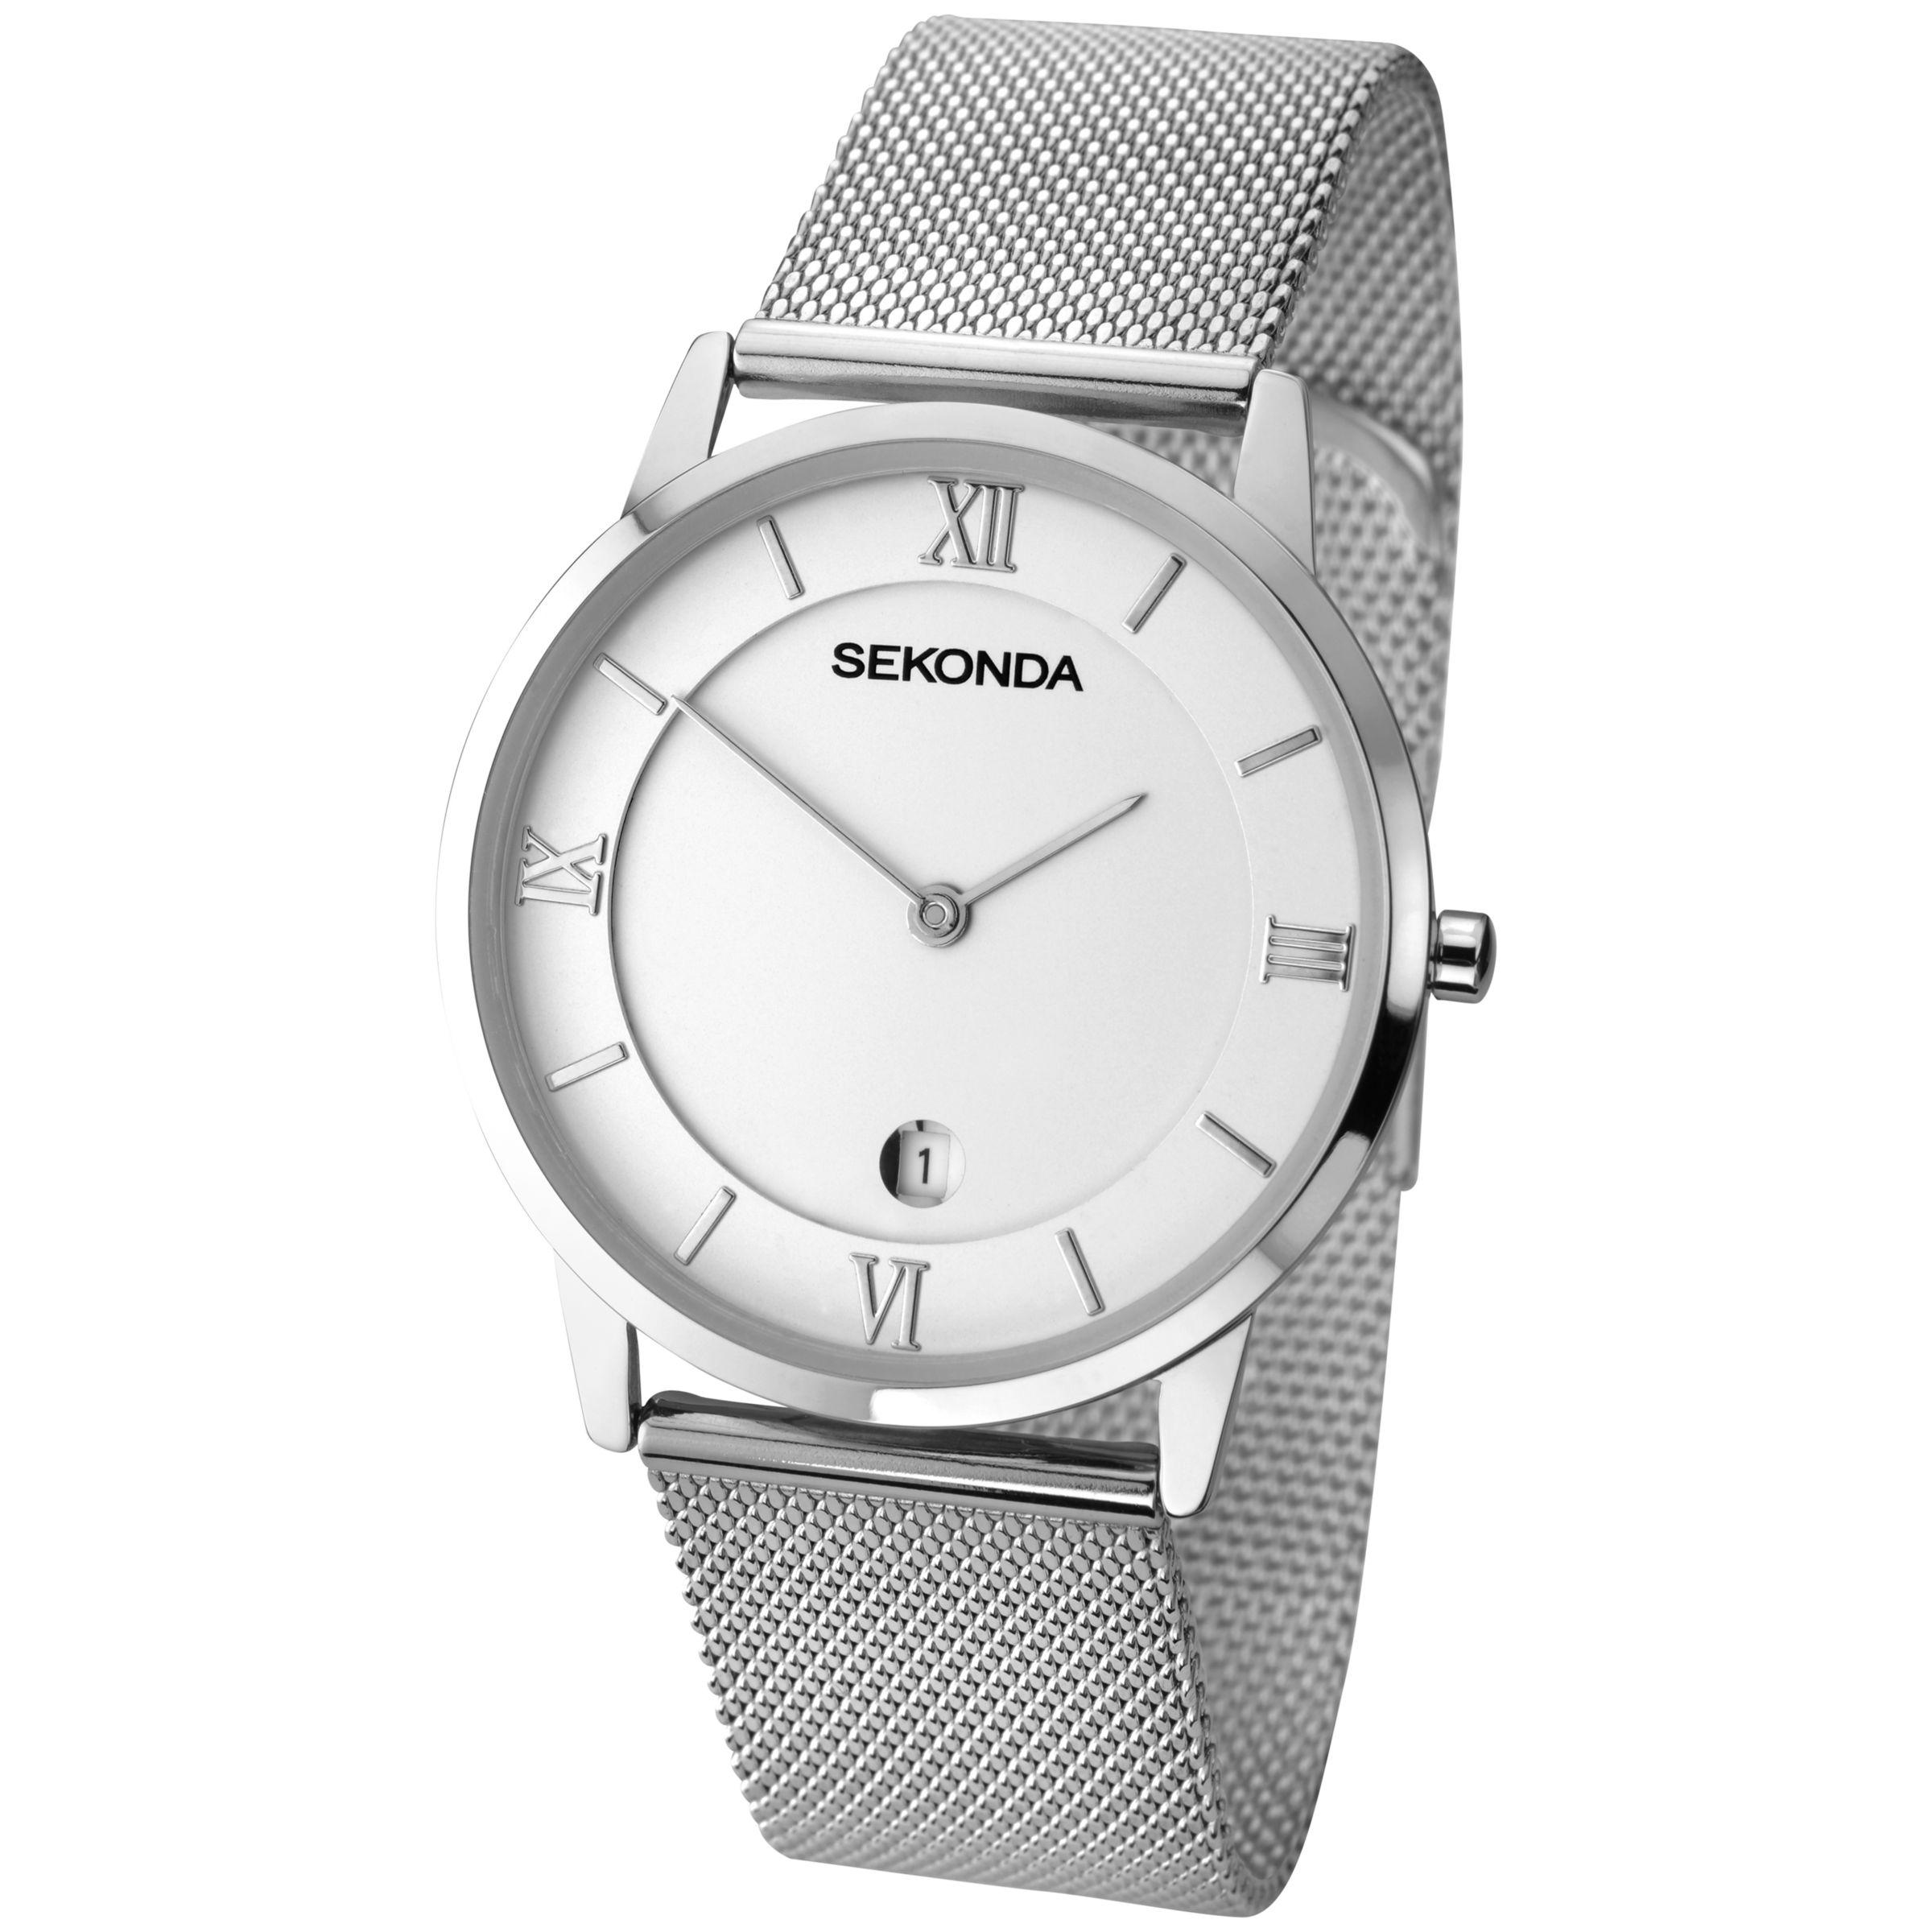 Sekonda Sekonda Men's Date Mesh Bracelet Strap Watch, Silver/White